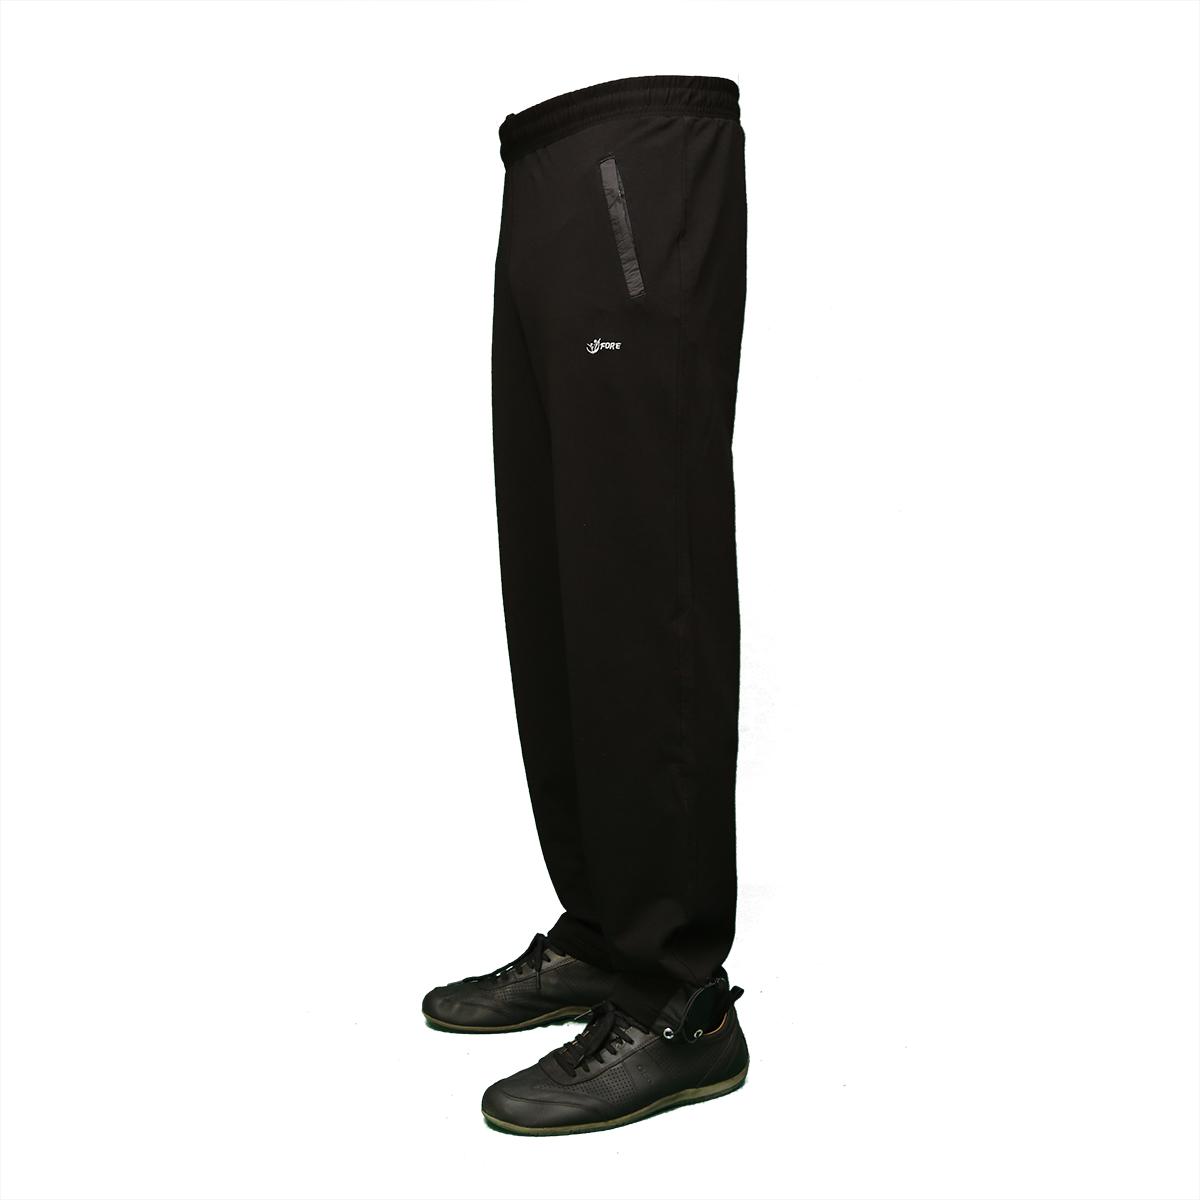 977747f2348dd Мужские брюки турция интернет магазин тм. FORE Турция арт.138 оптом ...